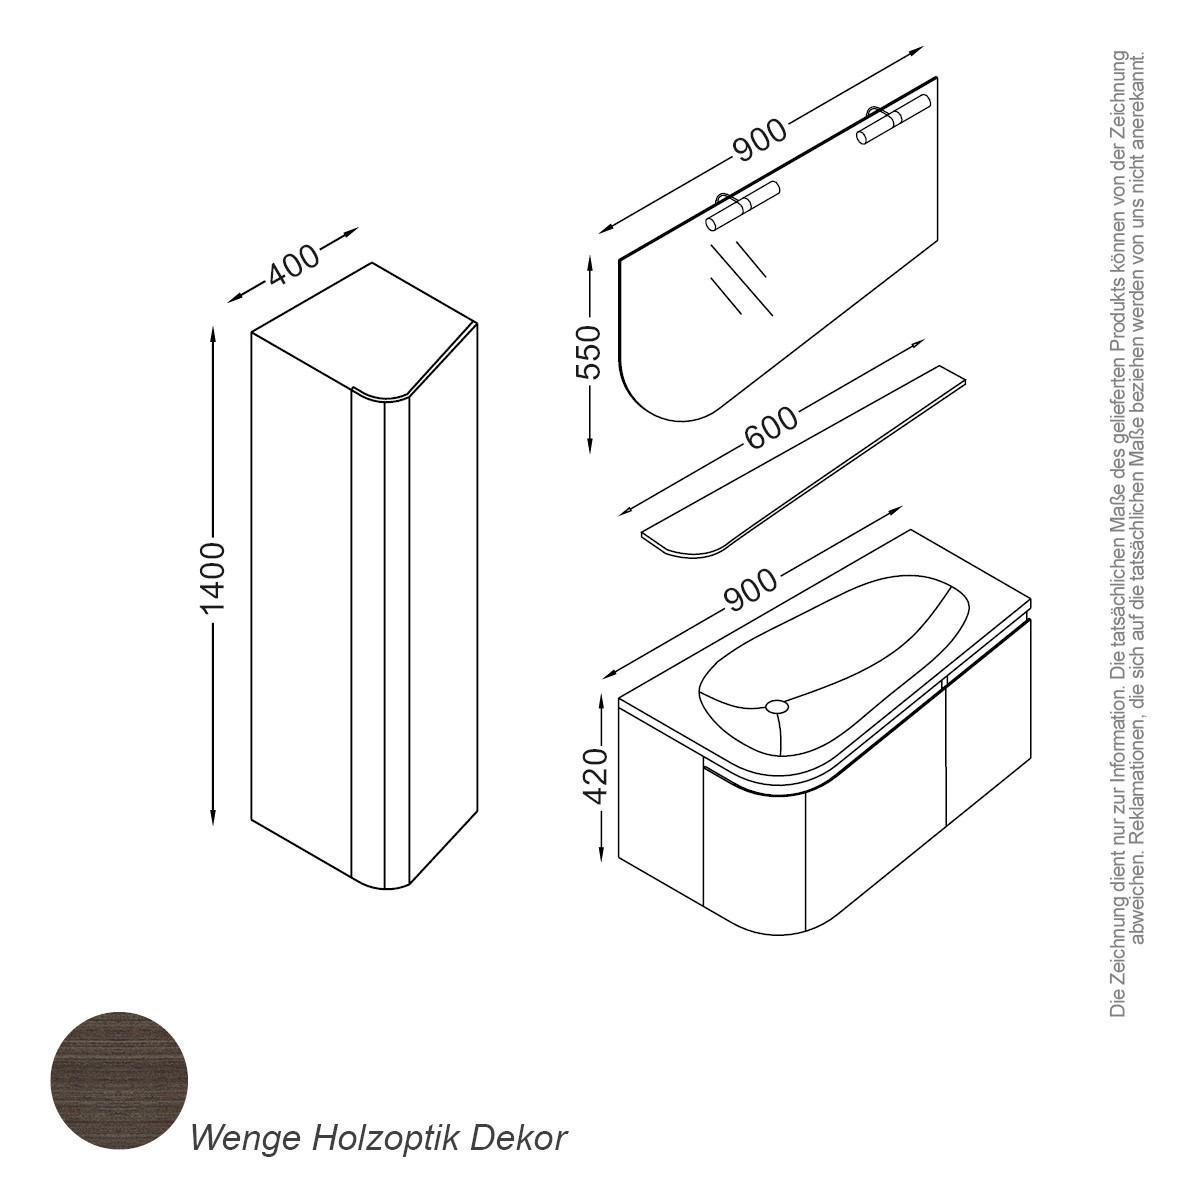 paket] monaco set 90 cm braun | four & more - onlineshop